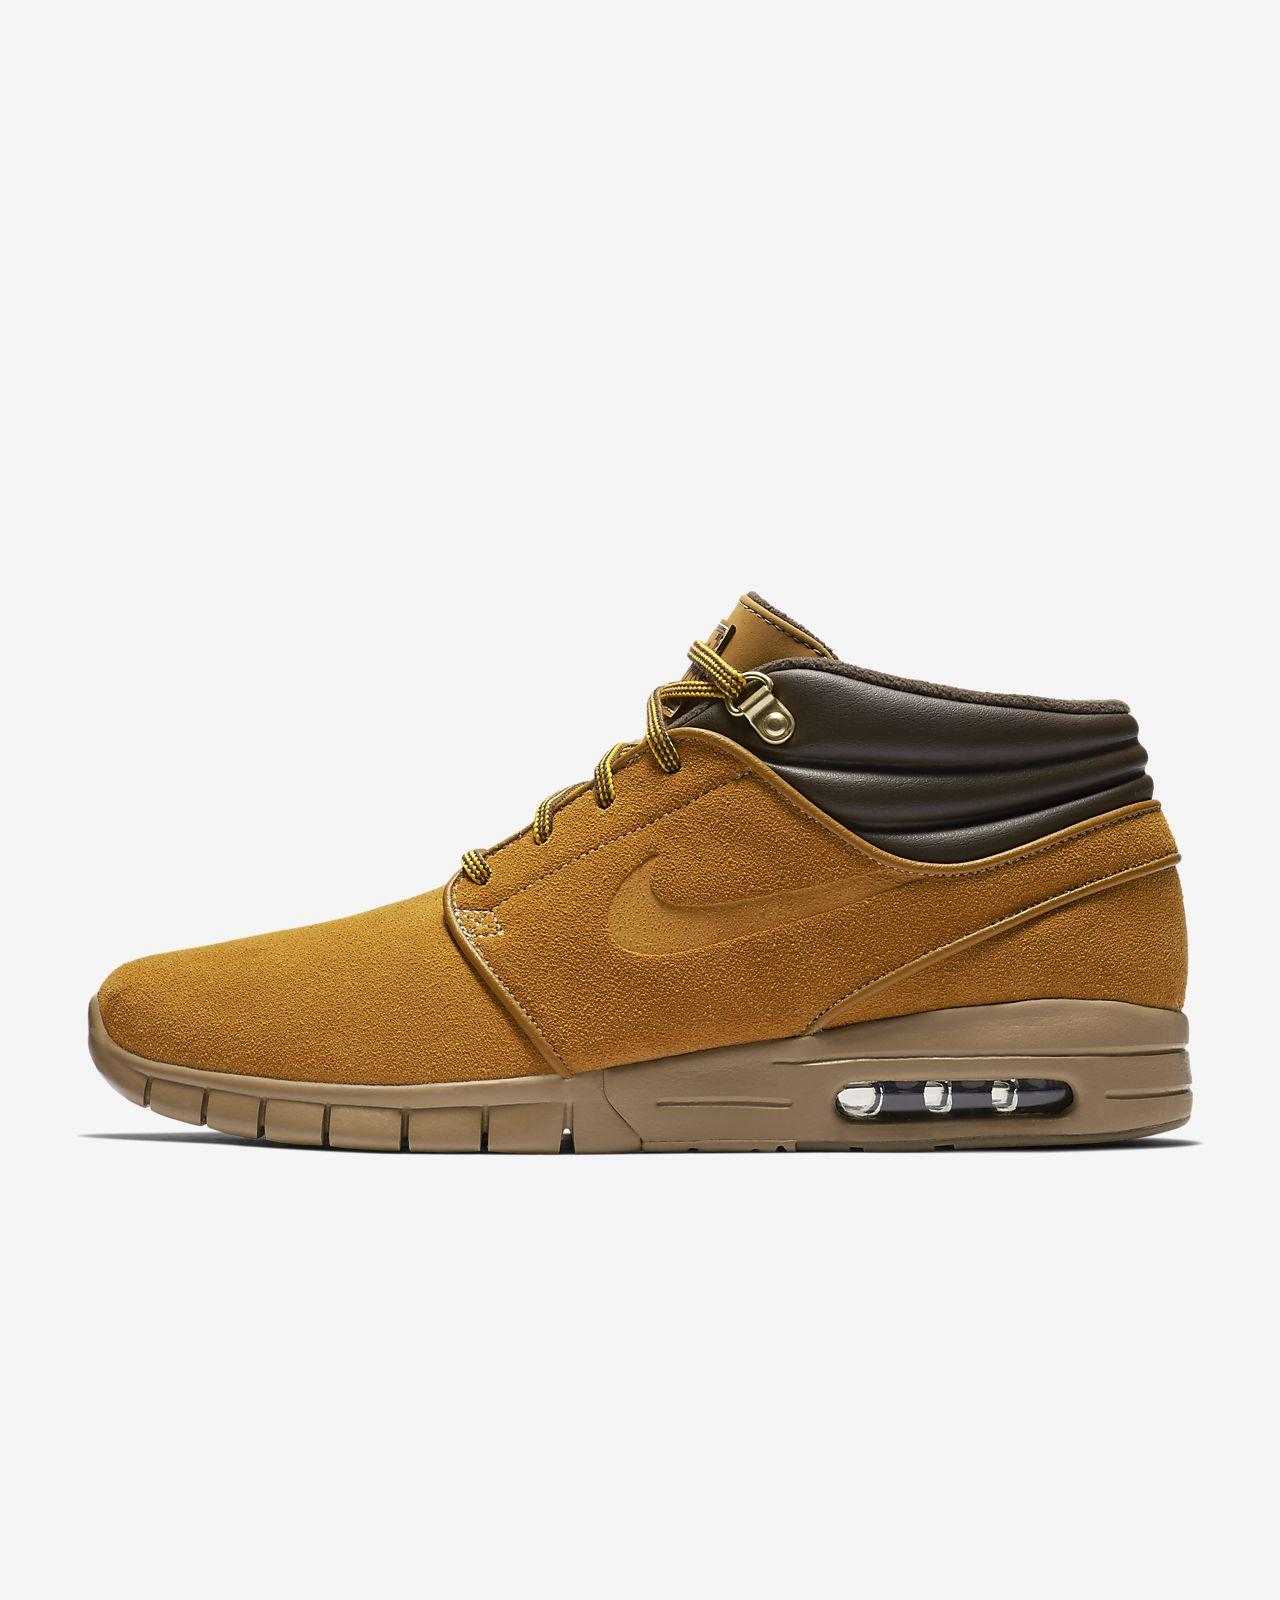 ccf8c2178f093b ... black wolf grey outlet 1a19d 4d518  discount code for nike sb stefan  janoski max mid premium mens skateboarding shoe 19208 82342